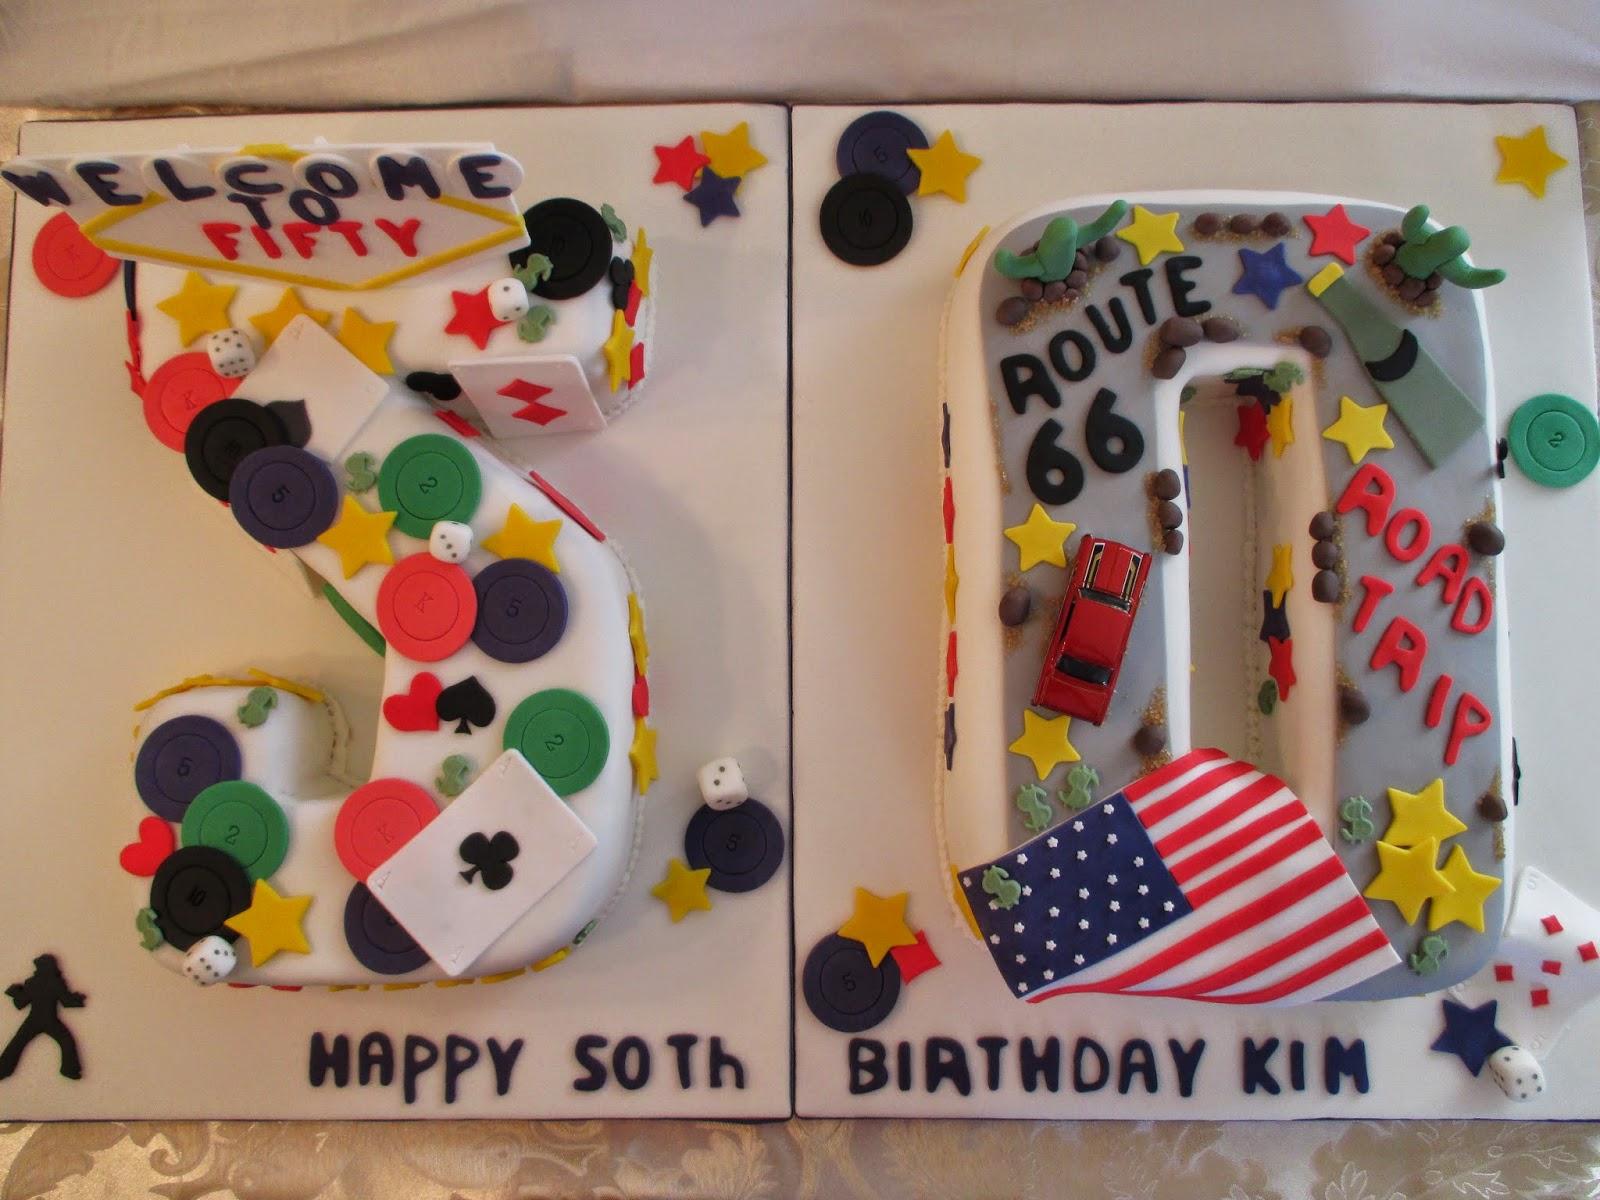 Viva Las Vegas A 50th Birthday Cake Sweet Treats By Kate